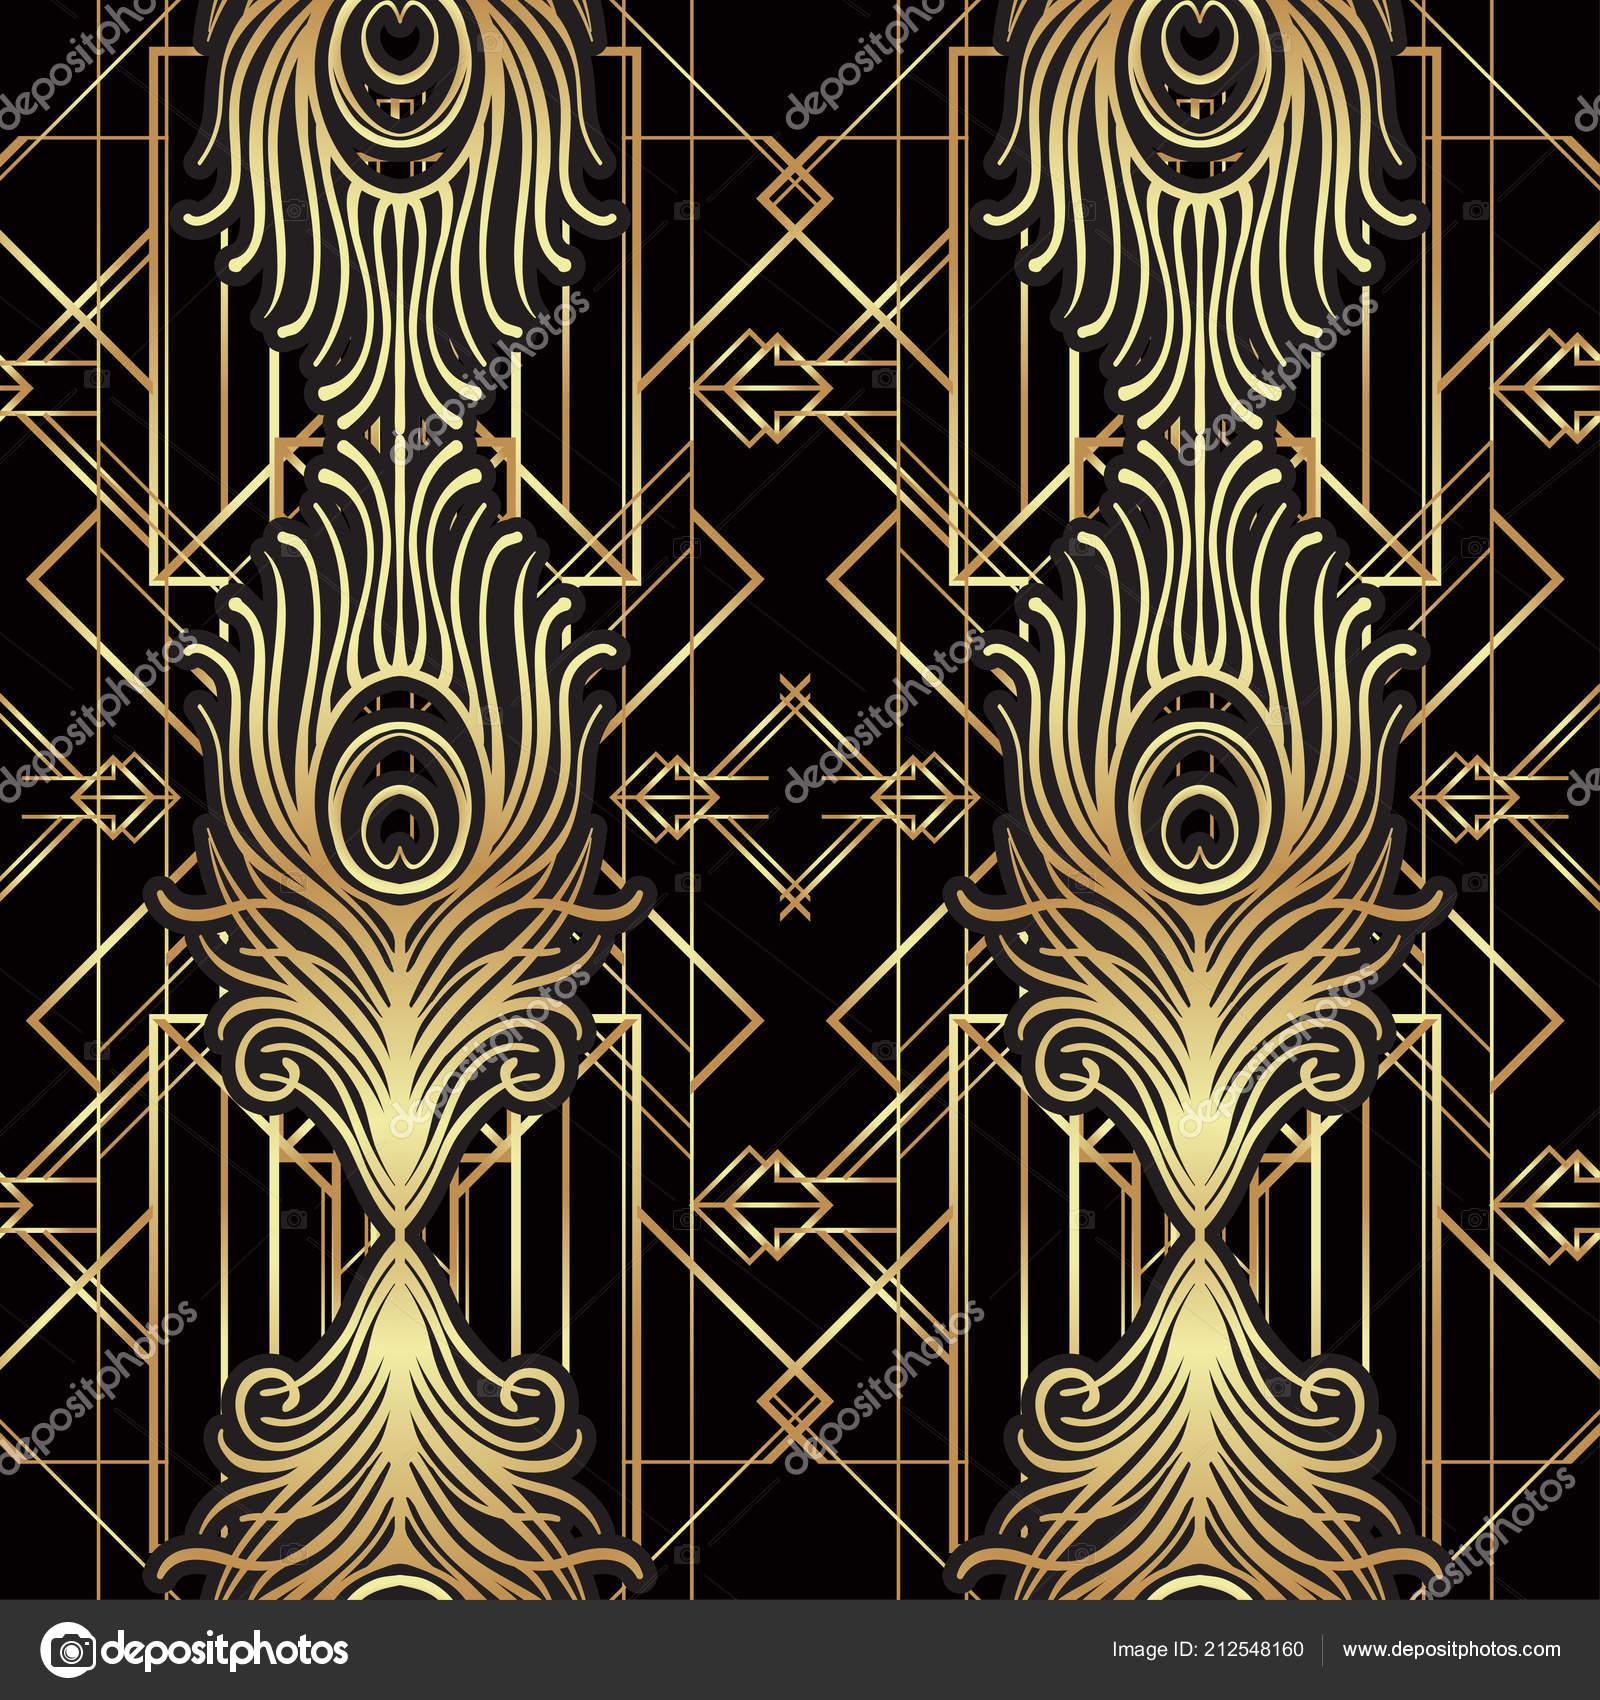 Roaring 1920's Design - Black And Gold Art Deco Designs , HD Wallpaper & Backgrounds